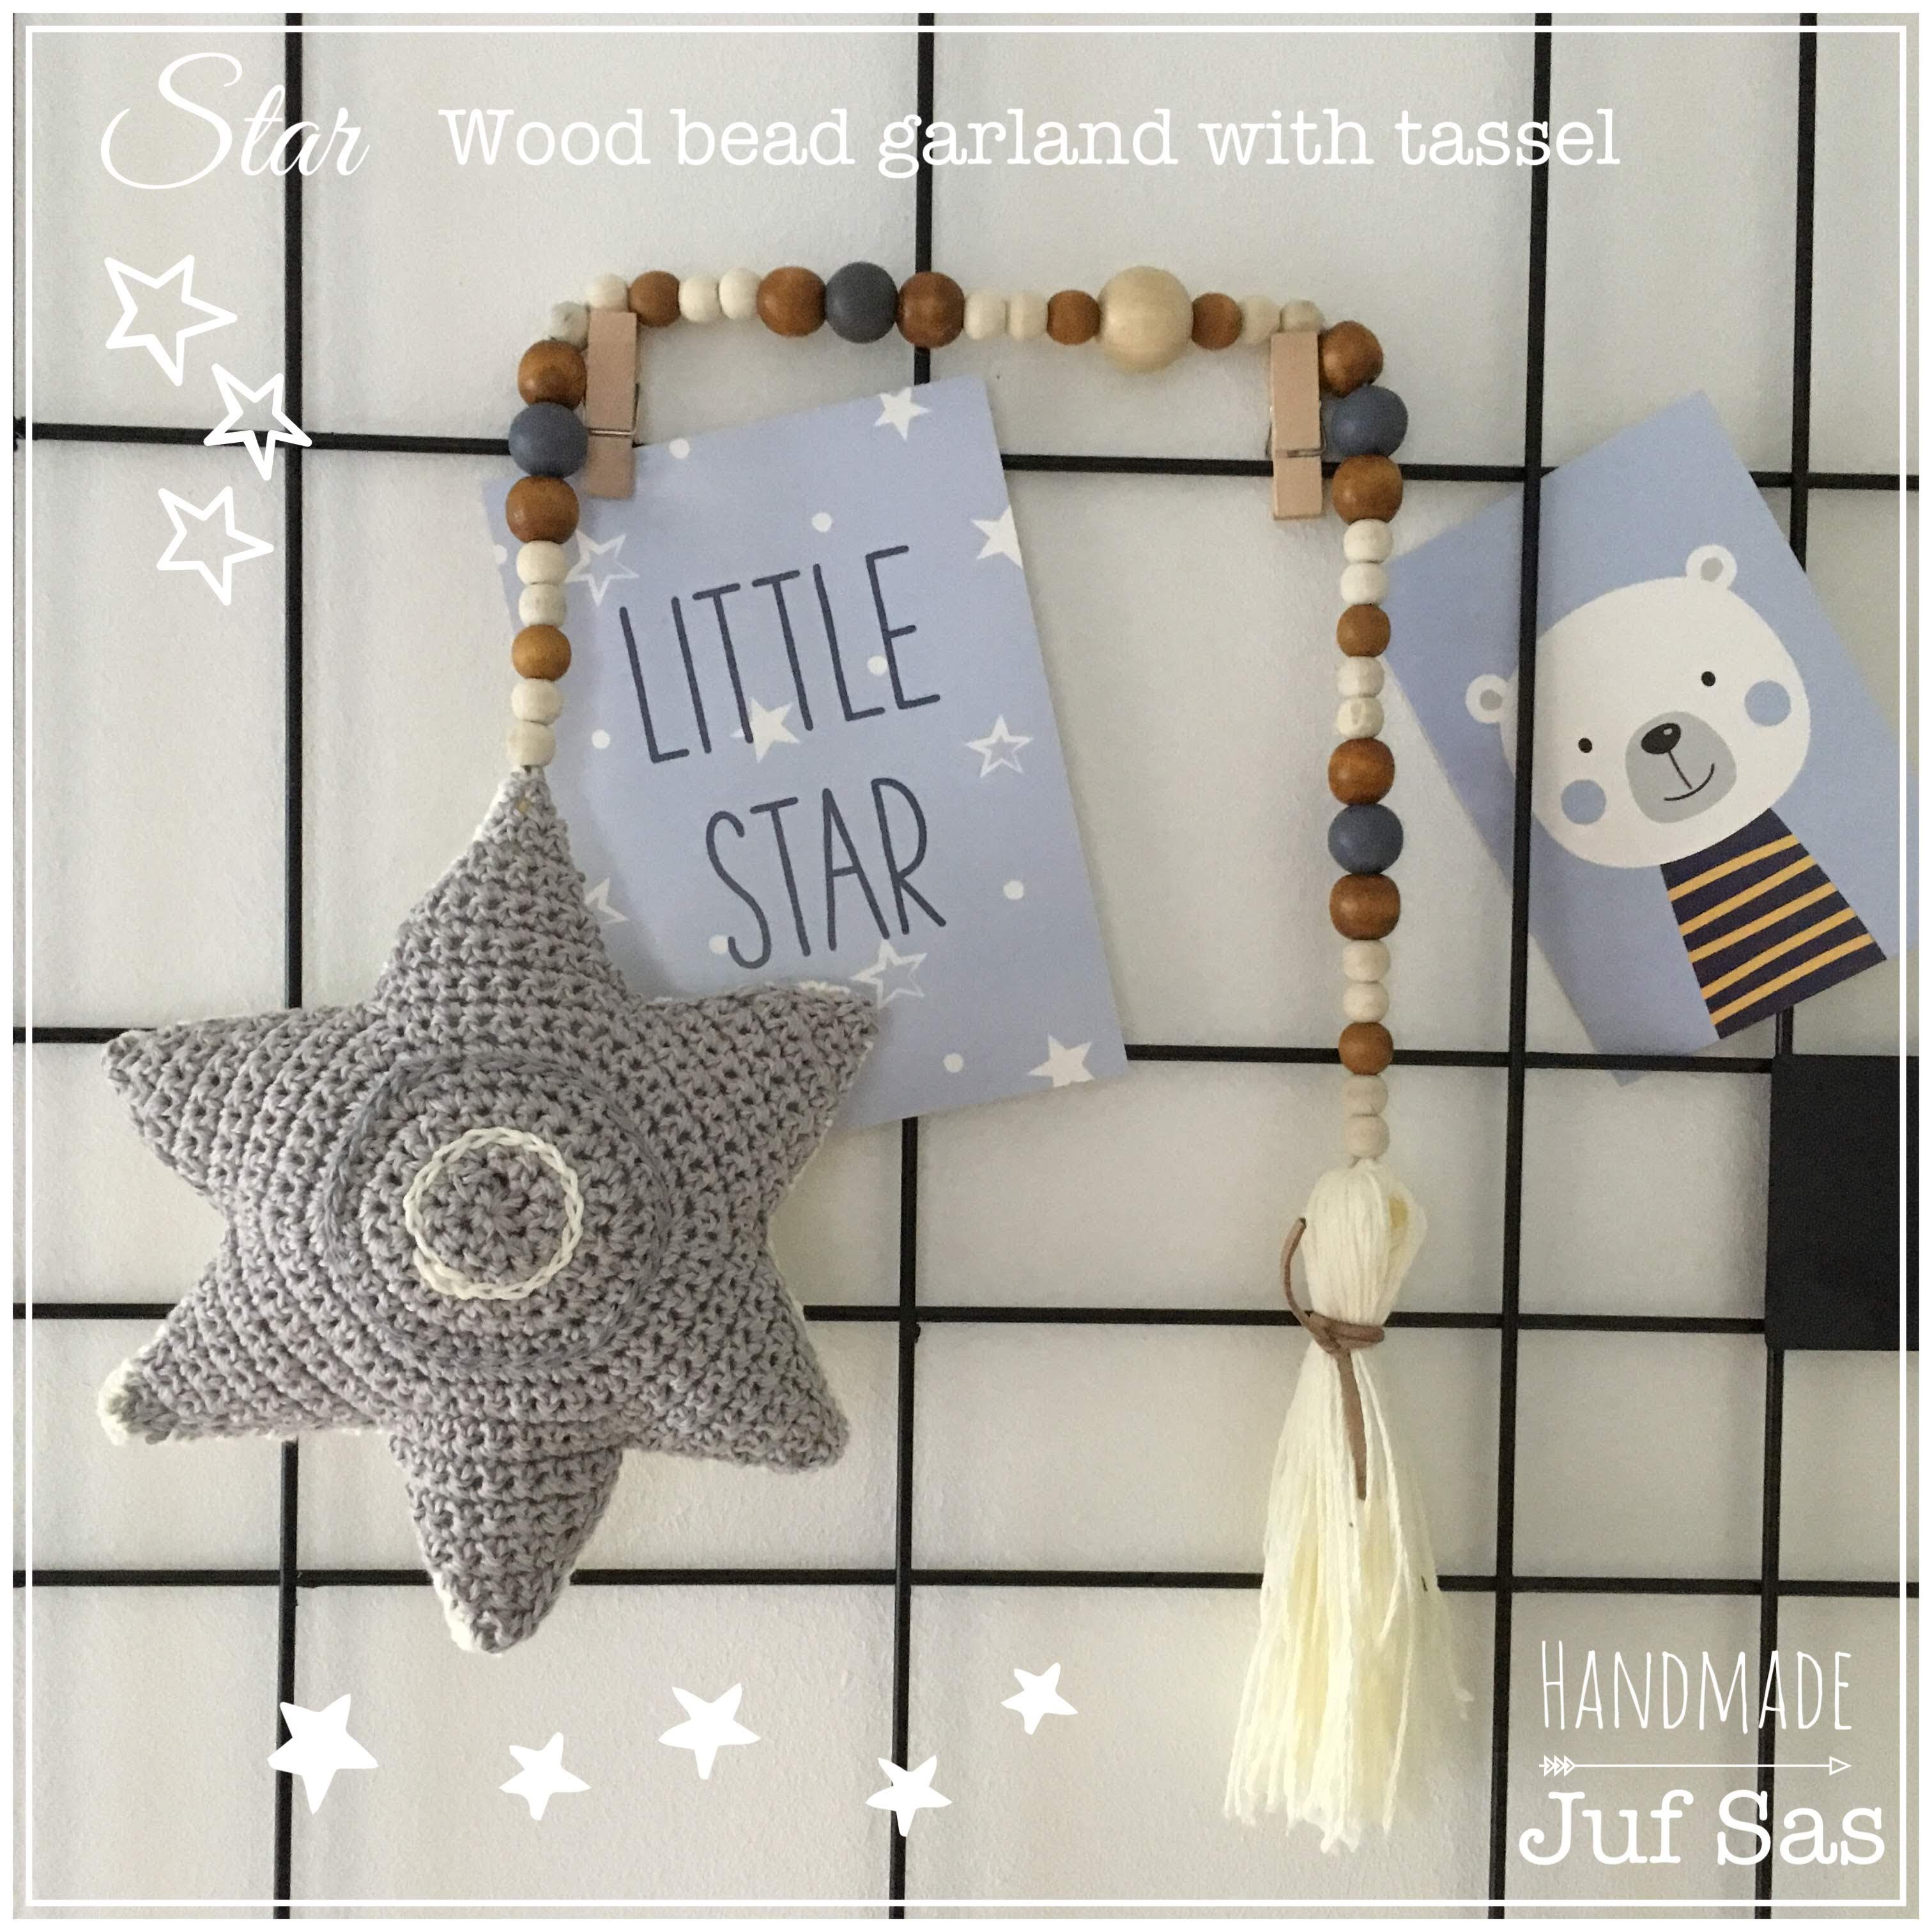 Star wood bead garland